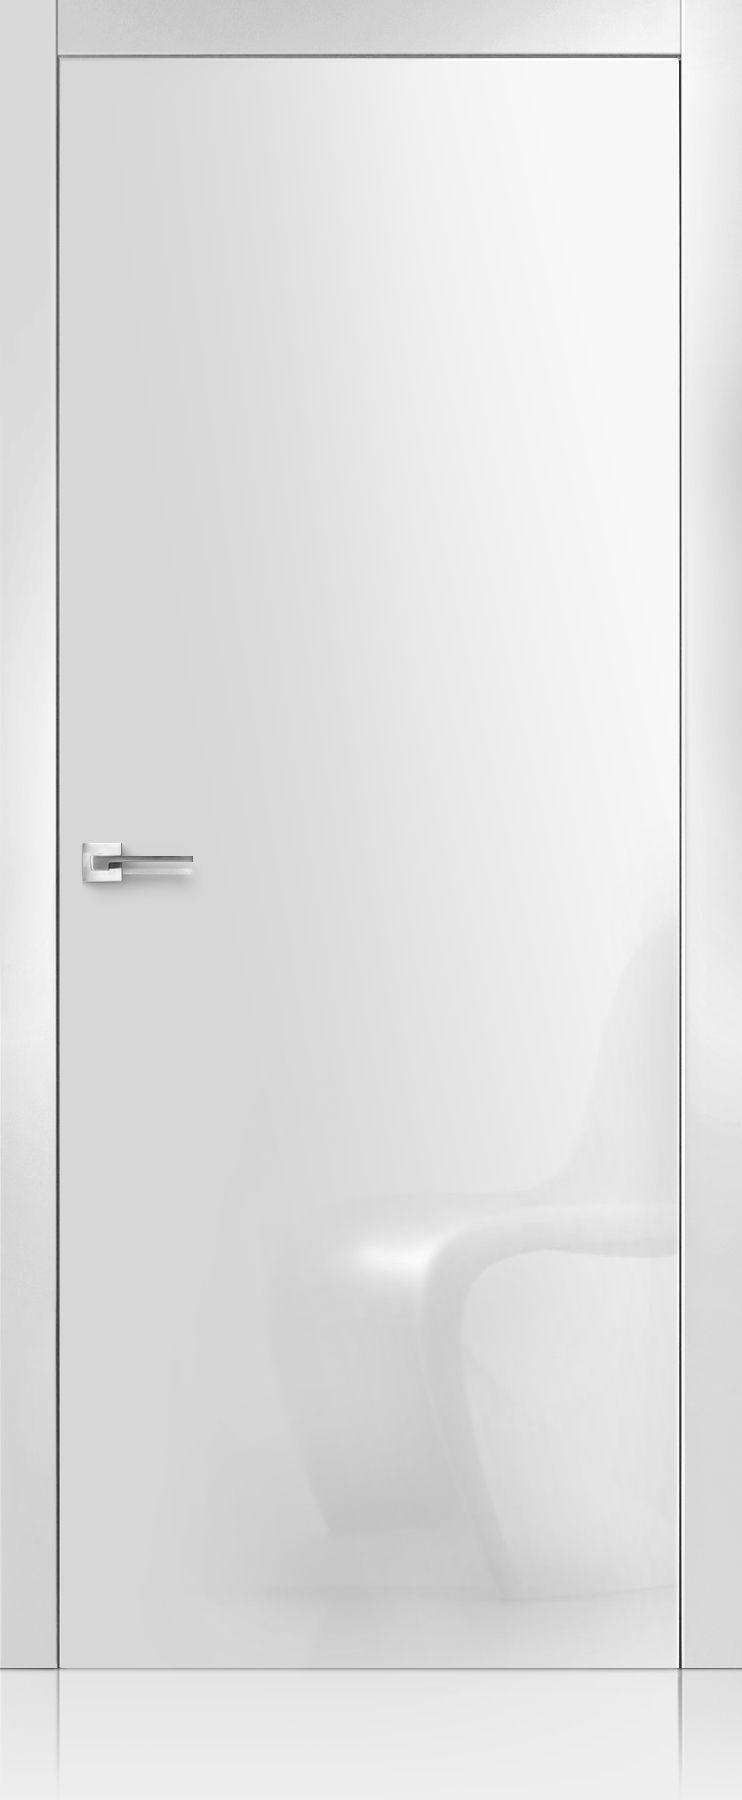 Ferrero Legno Porte / Exit / Exit / Bianco | Porte interne | Pinterest